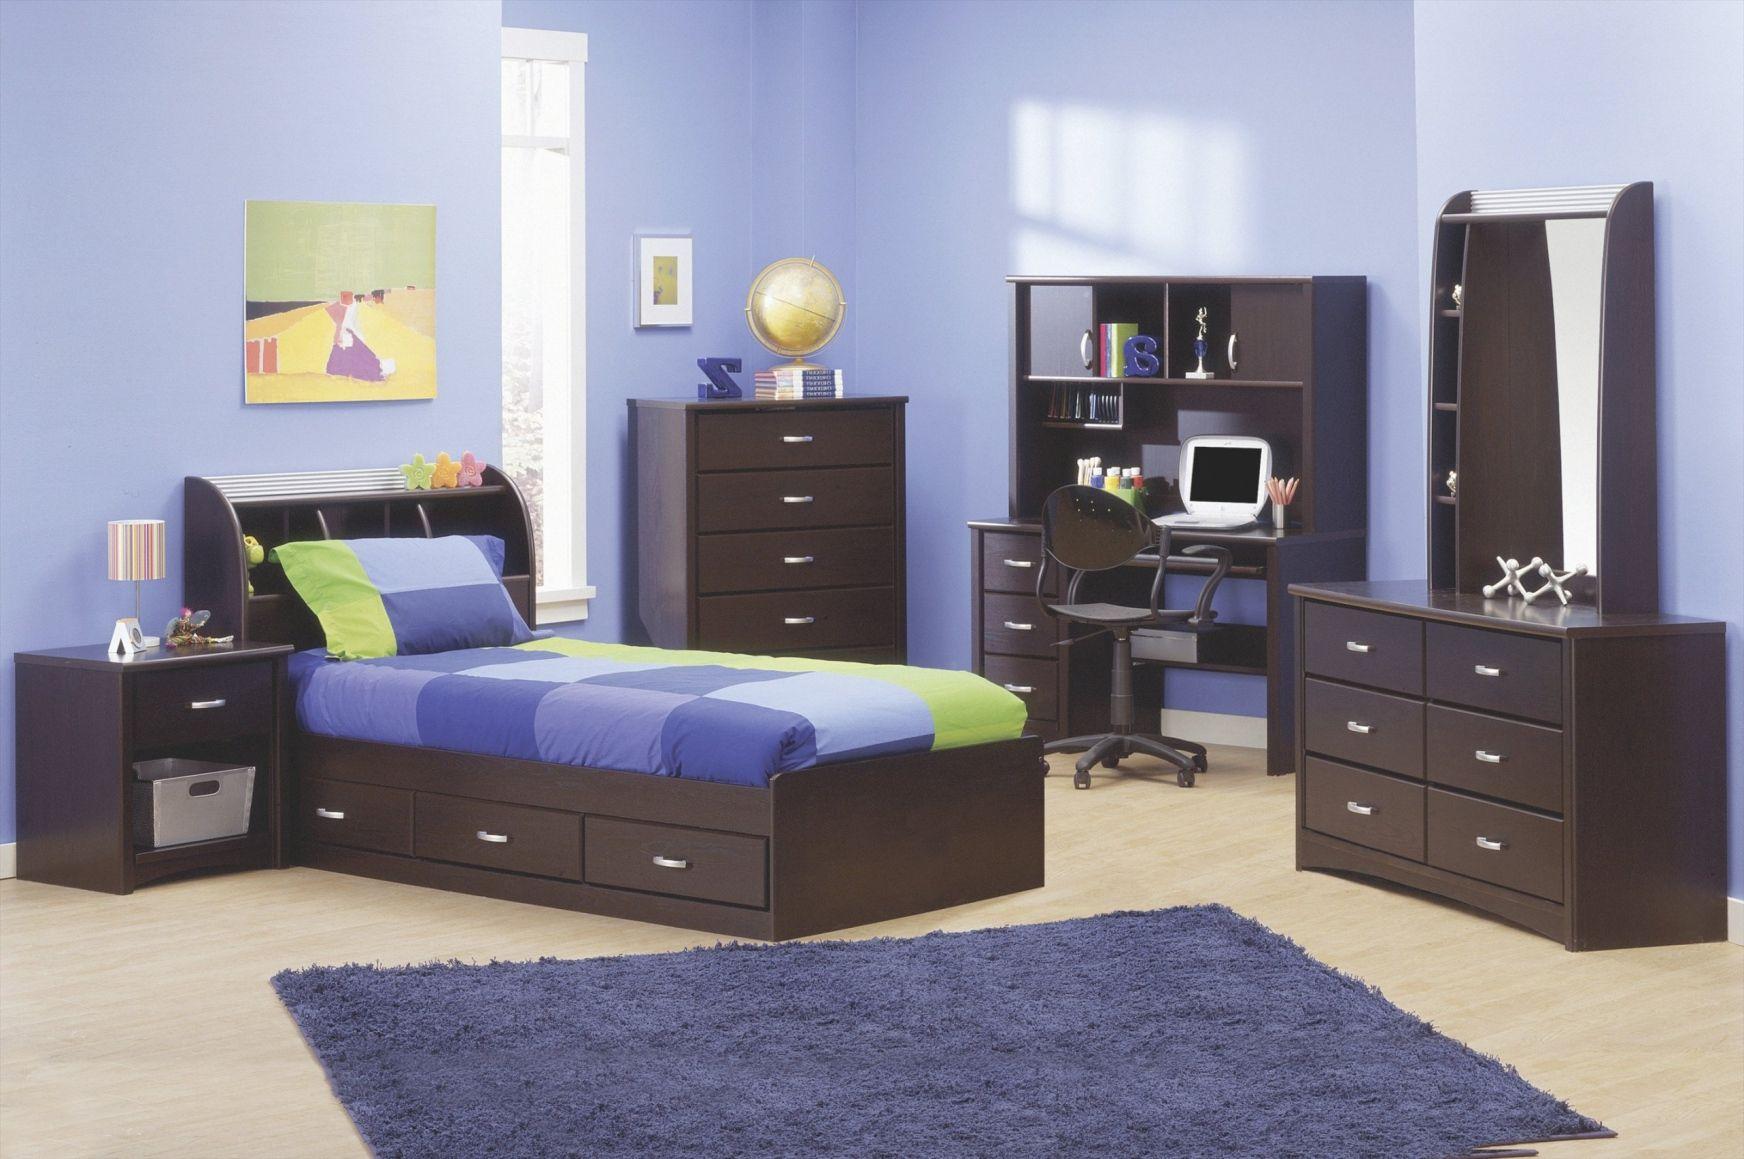 Kids Bedroom Furniture Clearance Interior Design Ideas - Girl bedroom furniture clearance